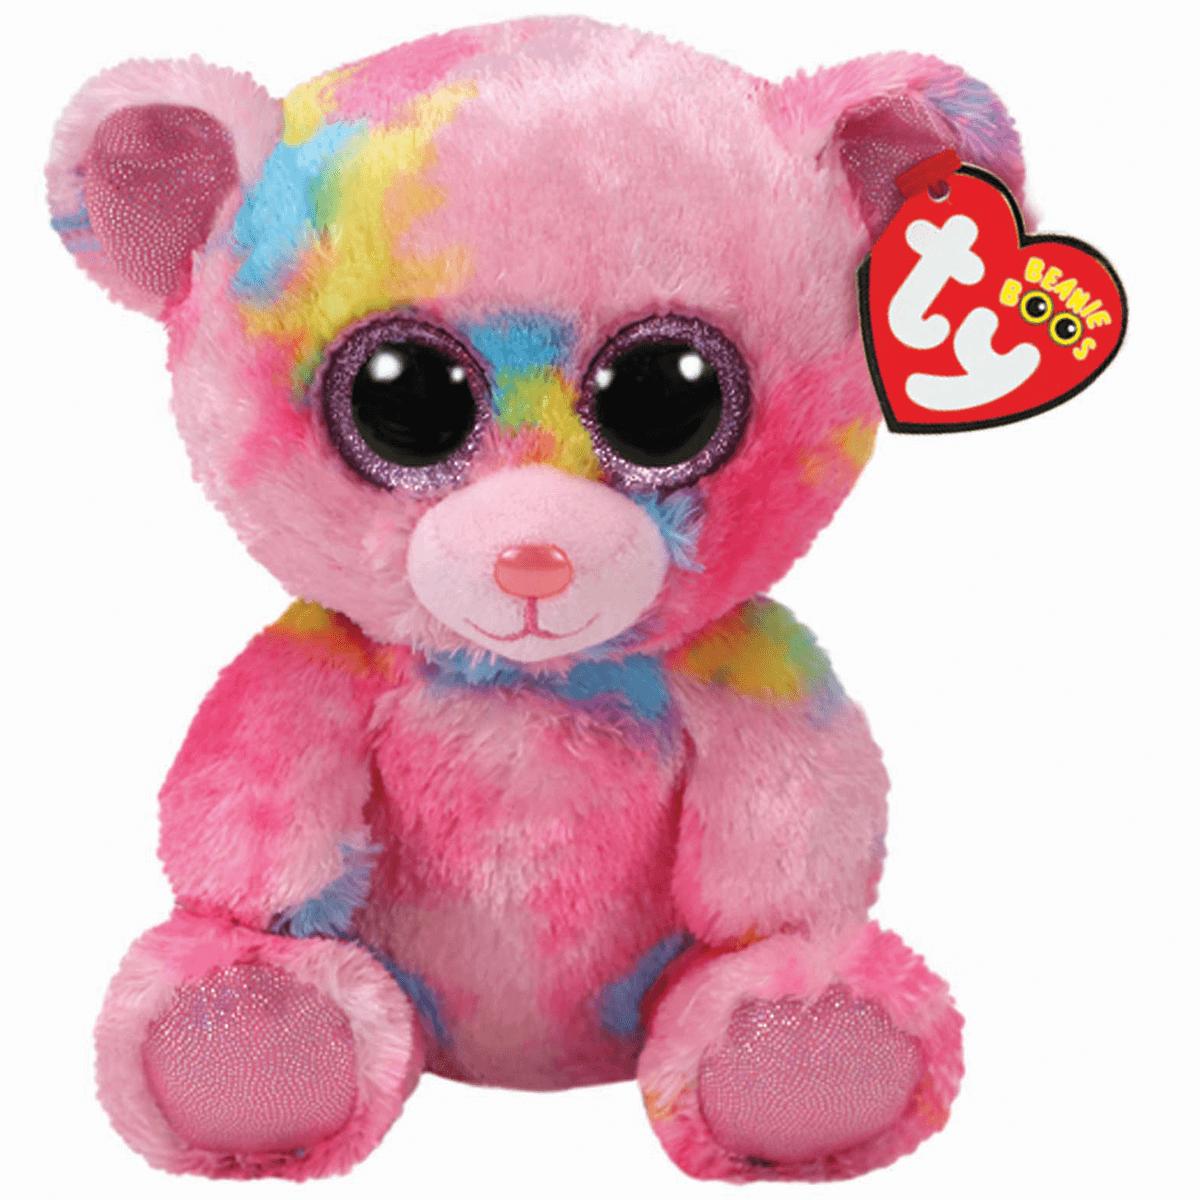 663e6dc1e89 Ty Beanie Boo 15cm Soft Toy - Franky the Bear